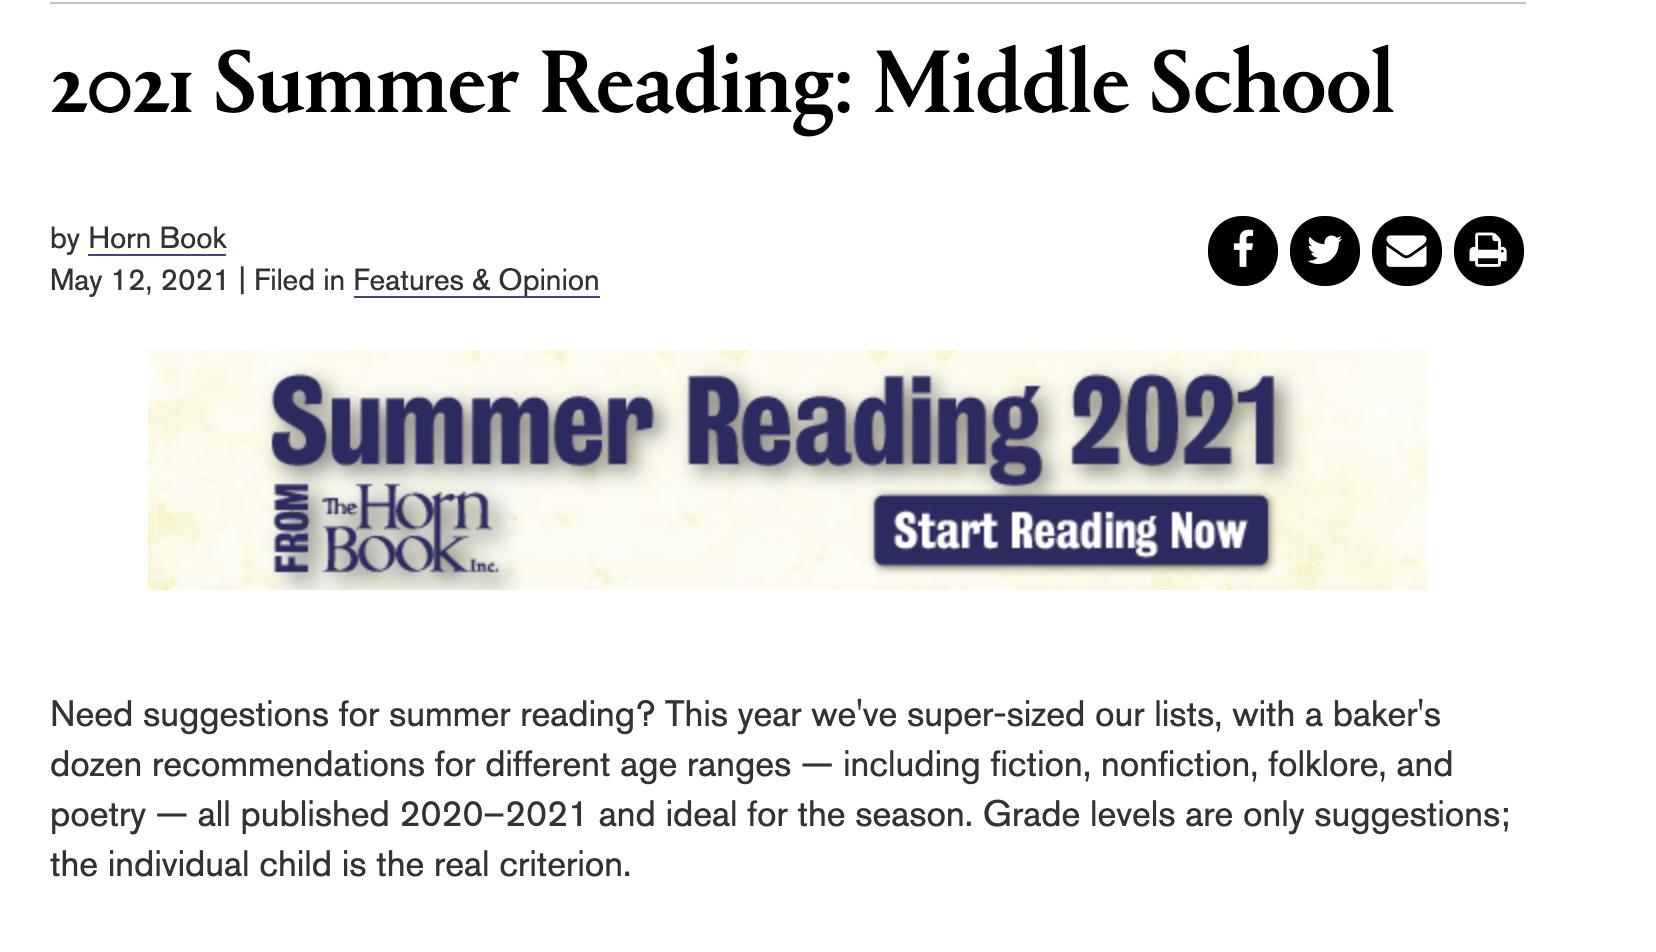 Horn Book Summer reading Guide